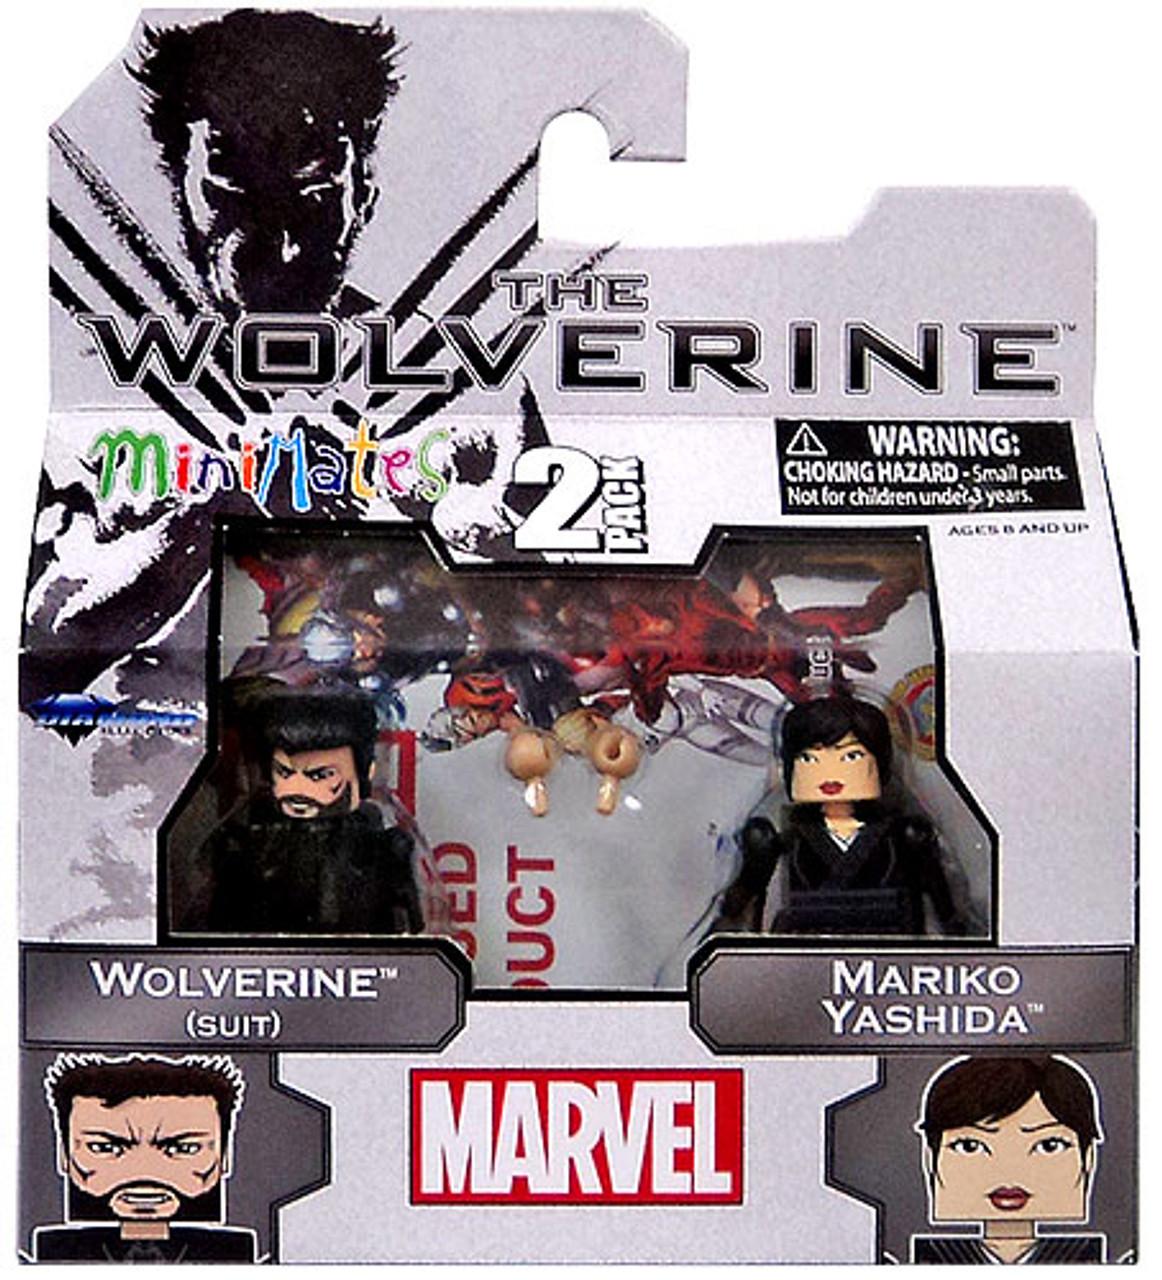 The Wolverine Minimates Series 52 Wolverine [Suit] & Mariko Yashida Minifigure 2-Pack